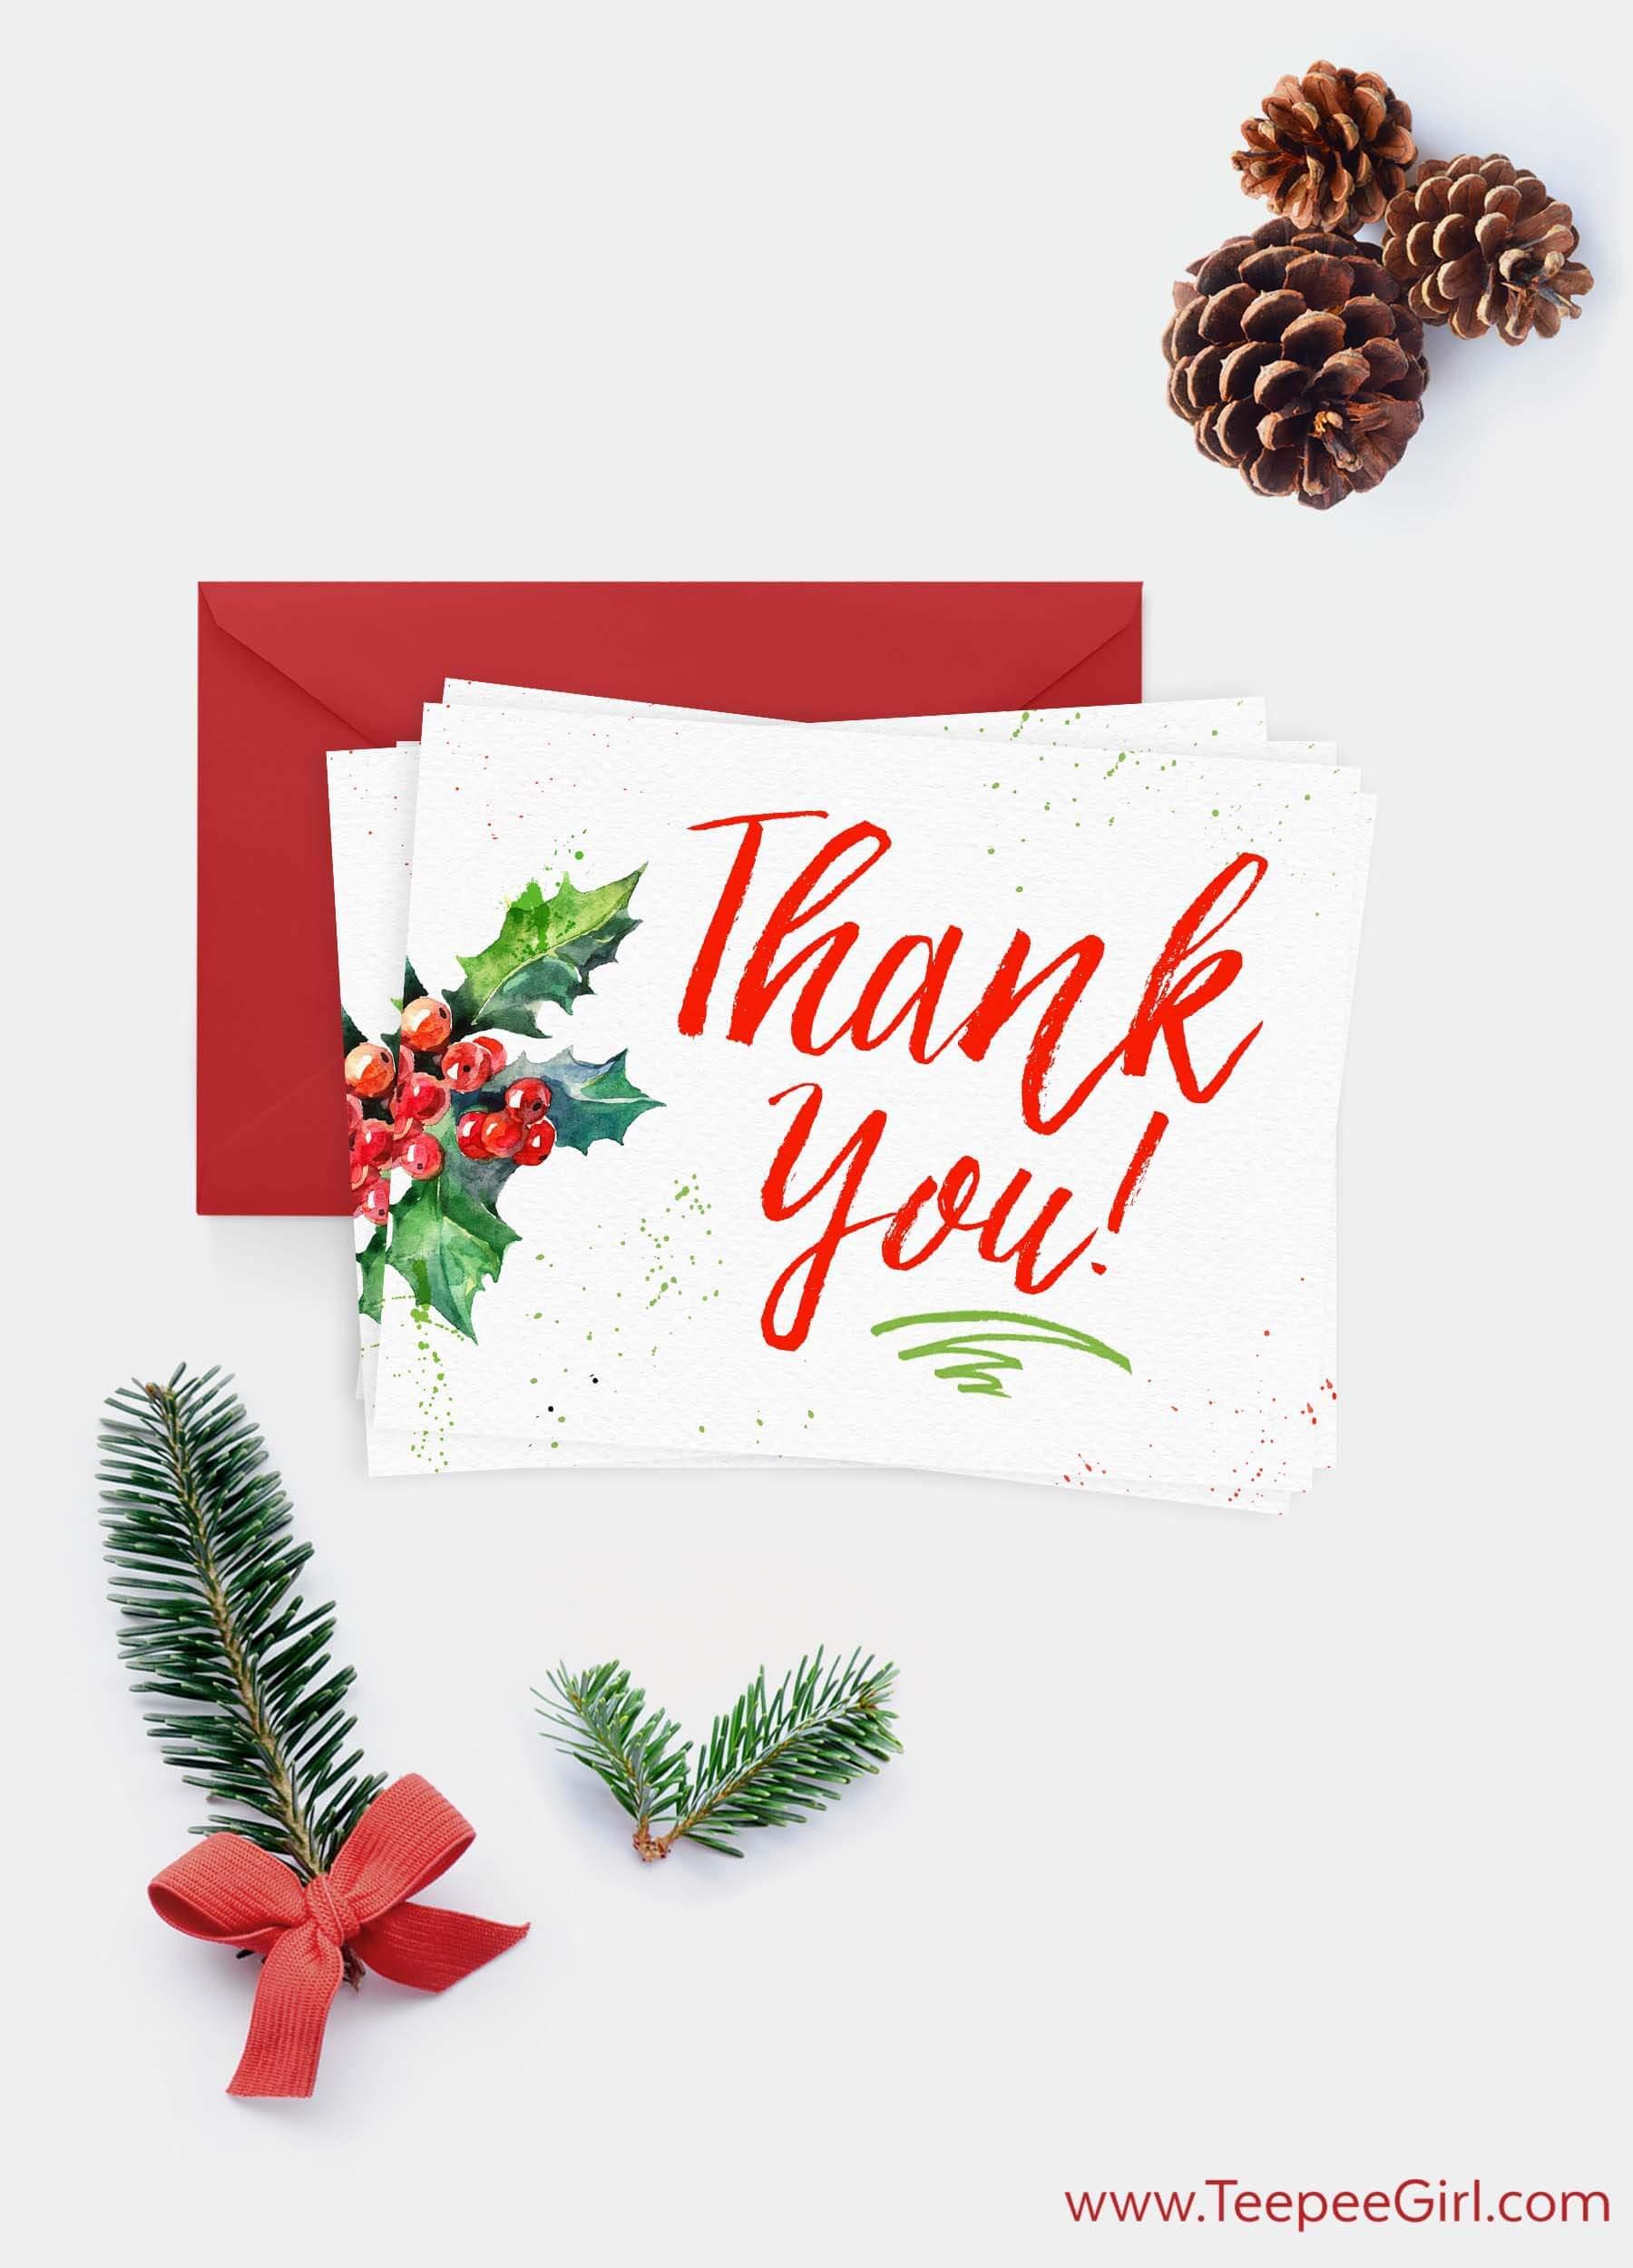 Christmas Thank You Cards #LIGHTtheWORLD www.TeepeeGirl.com